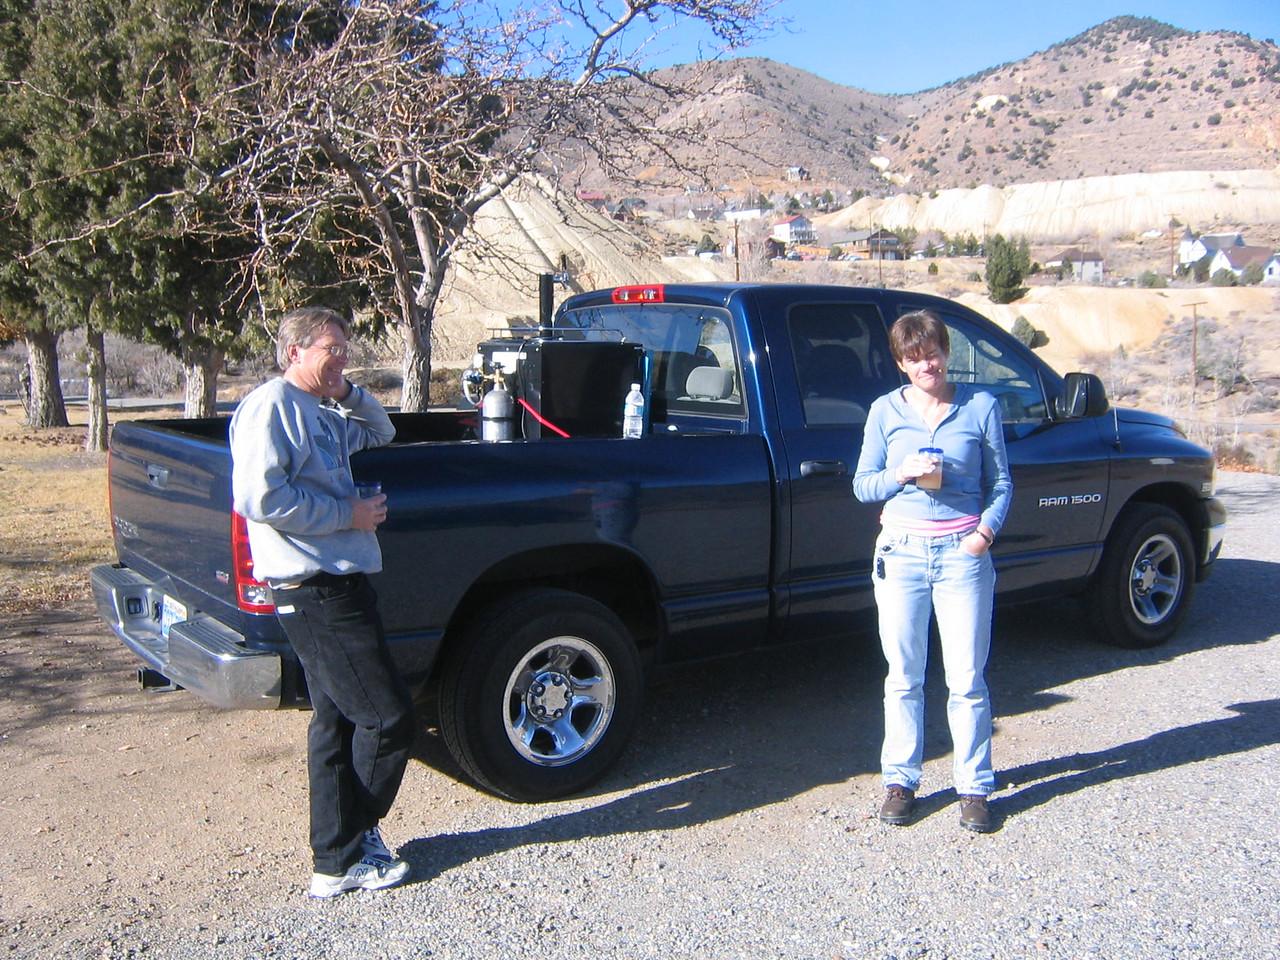 VALUED CARGO -- Patrick and MJ ensure no damage ocurred during transit.